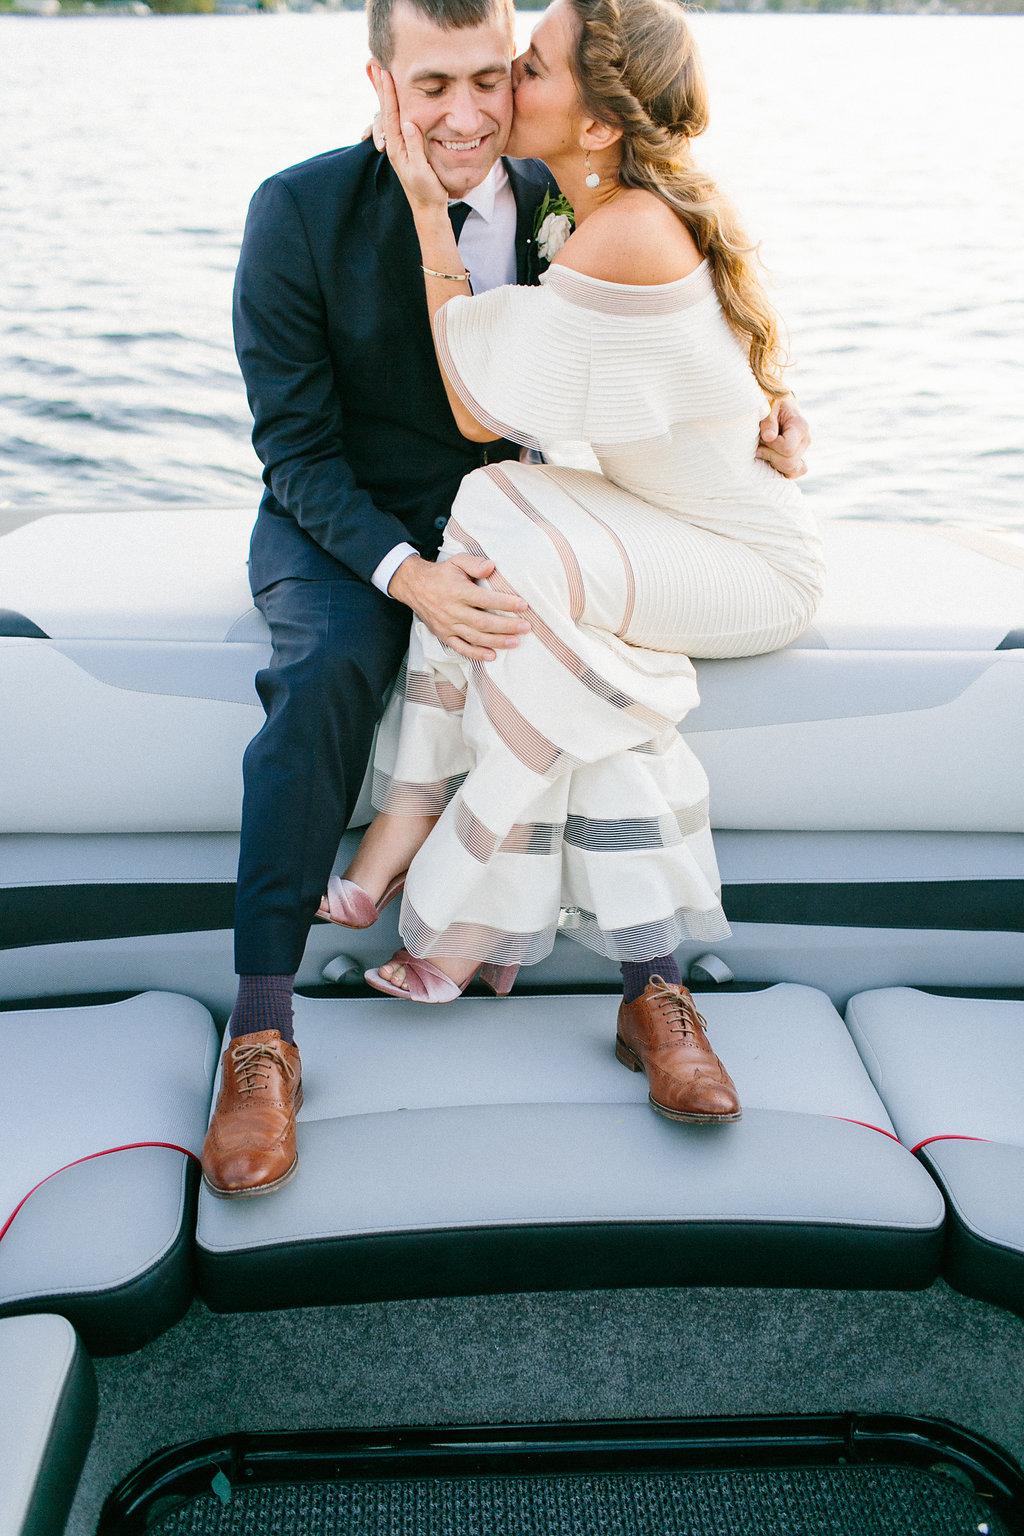 2017_Carly_Milbrath_Backyard_Wedding_Wayzata_MN_607-2.JPG